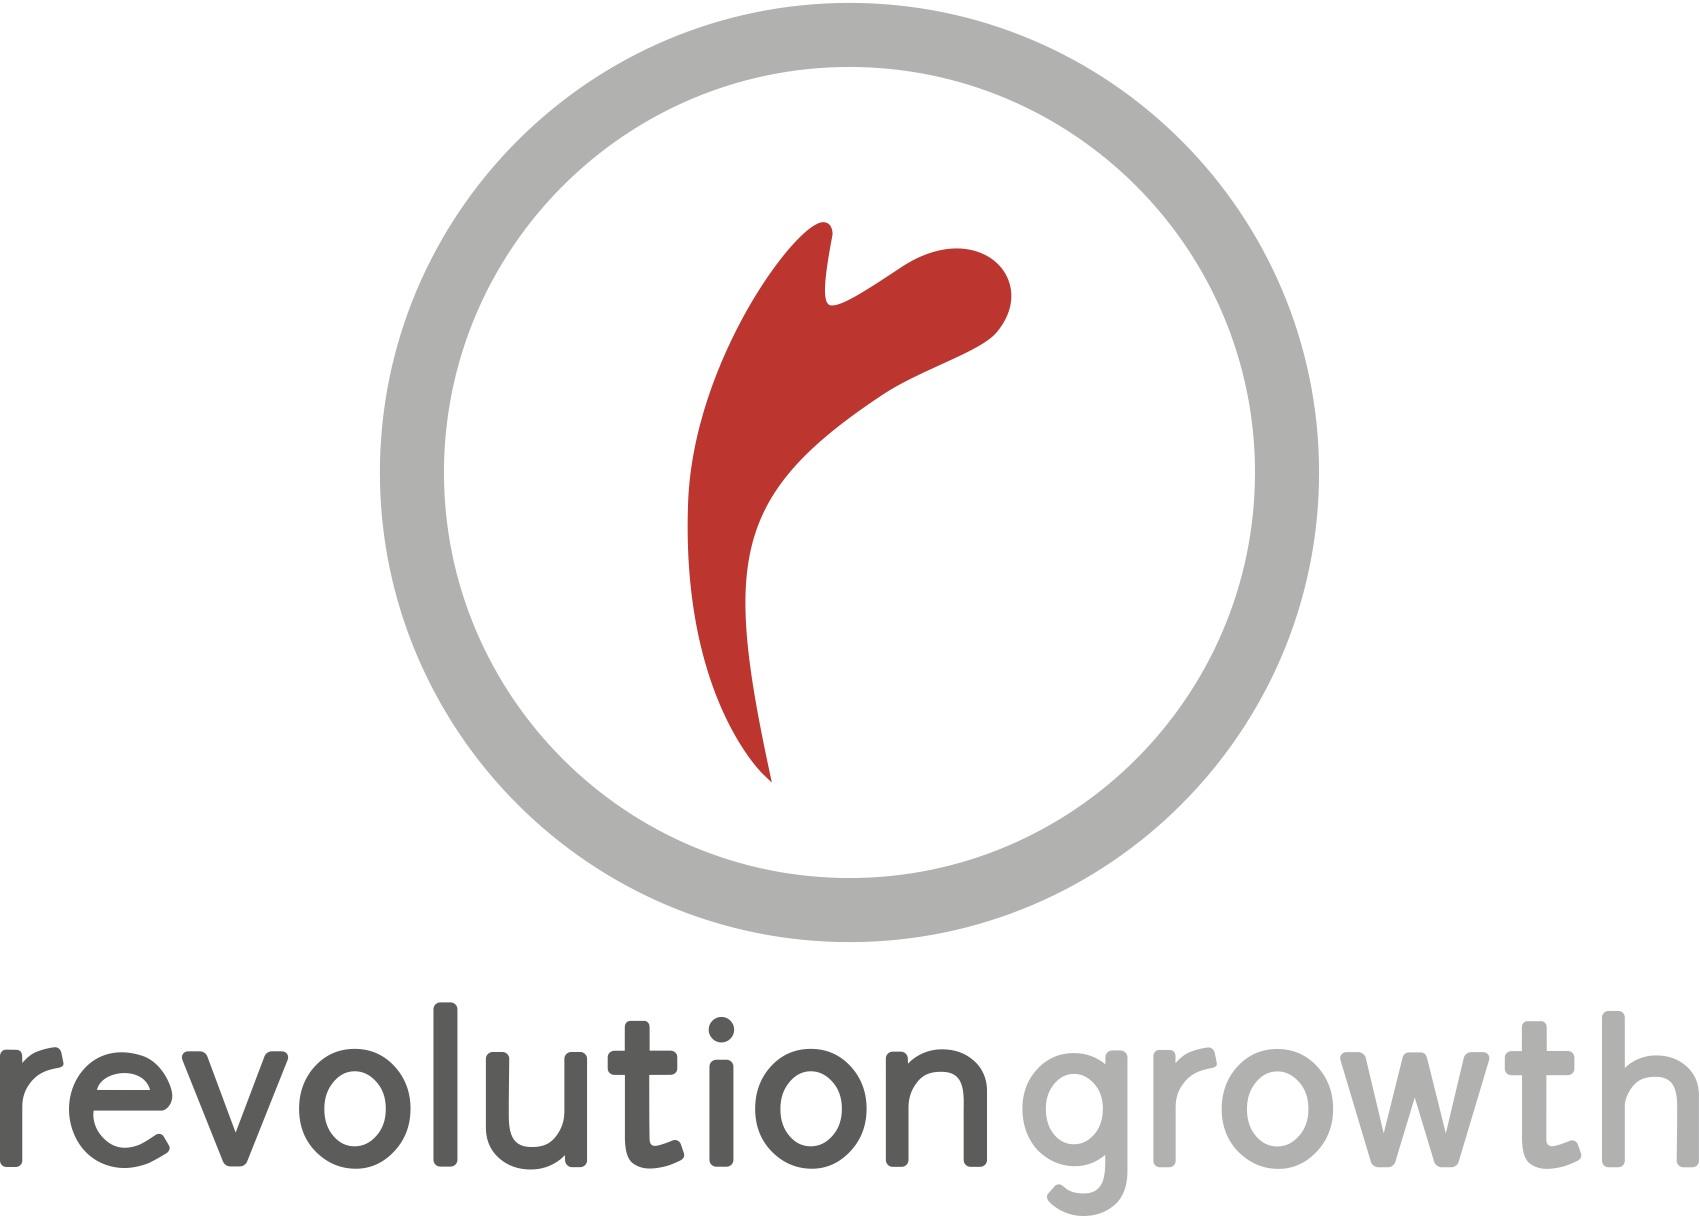 rev_growth